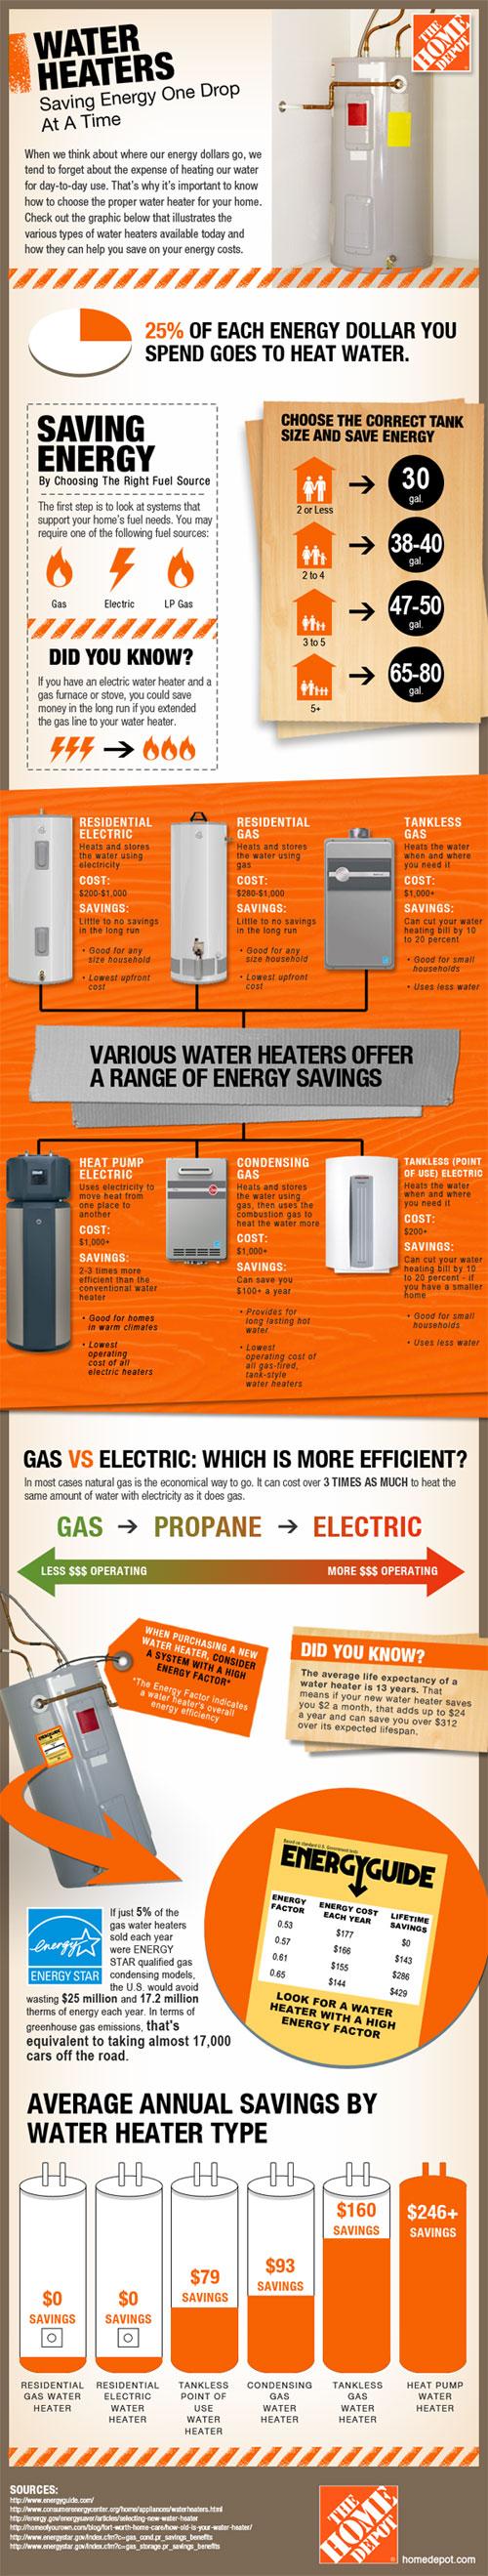 energy_saving_water_heater_infographic